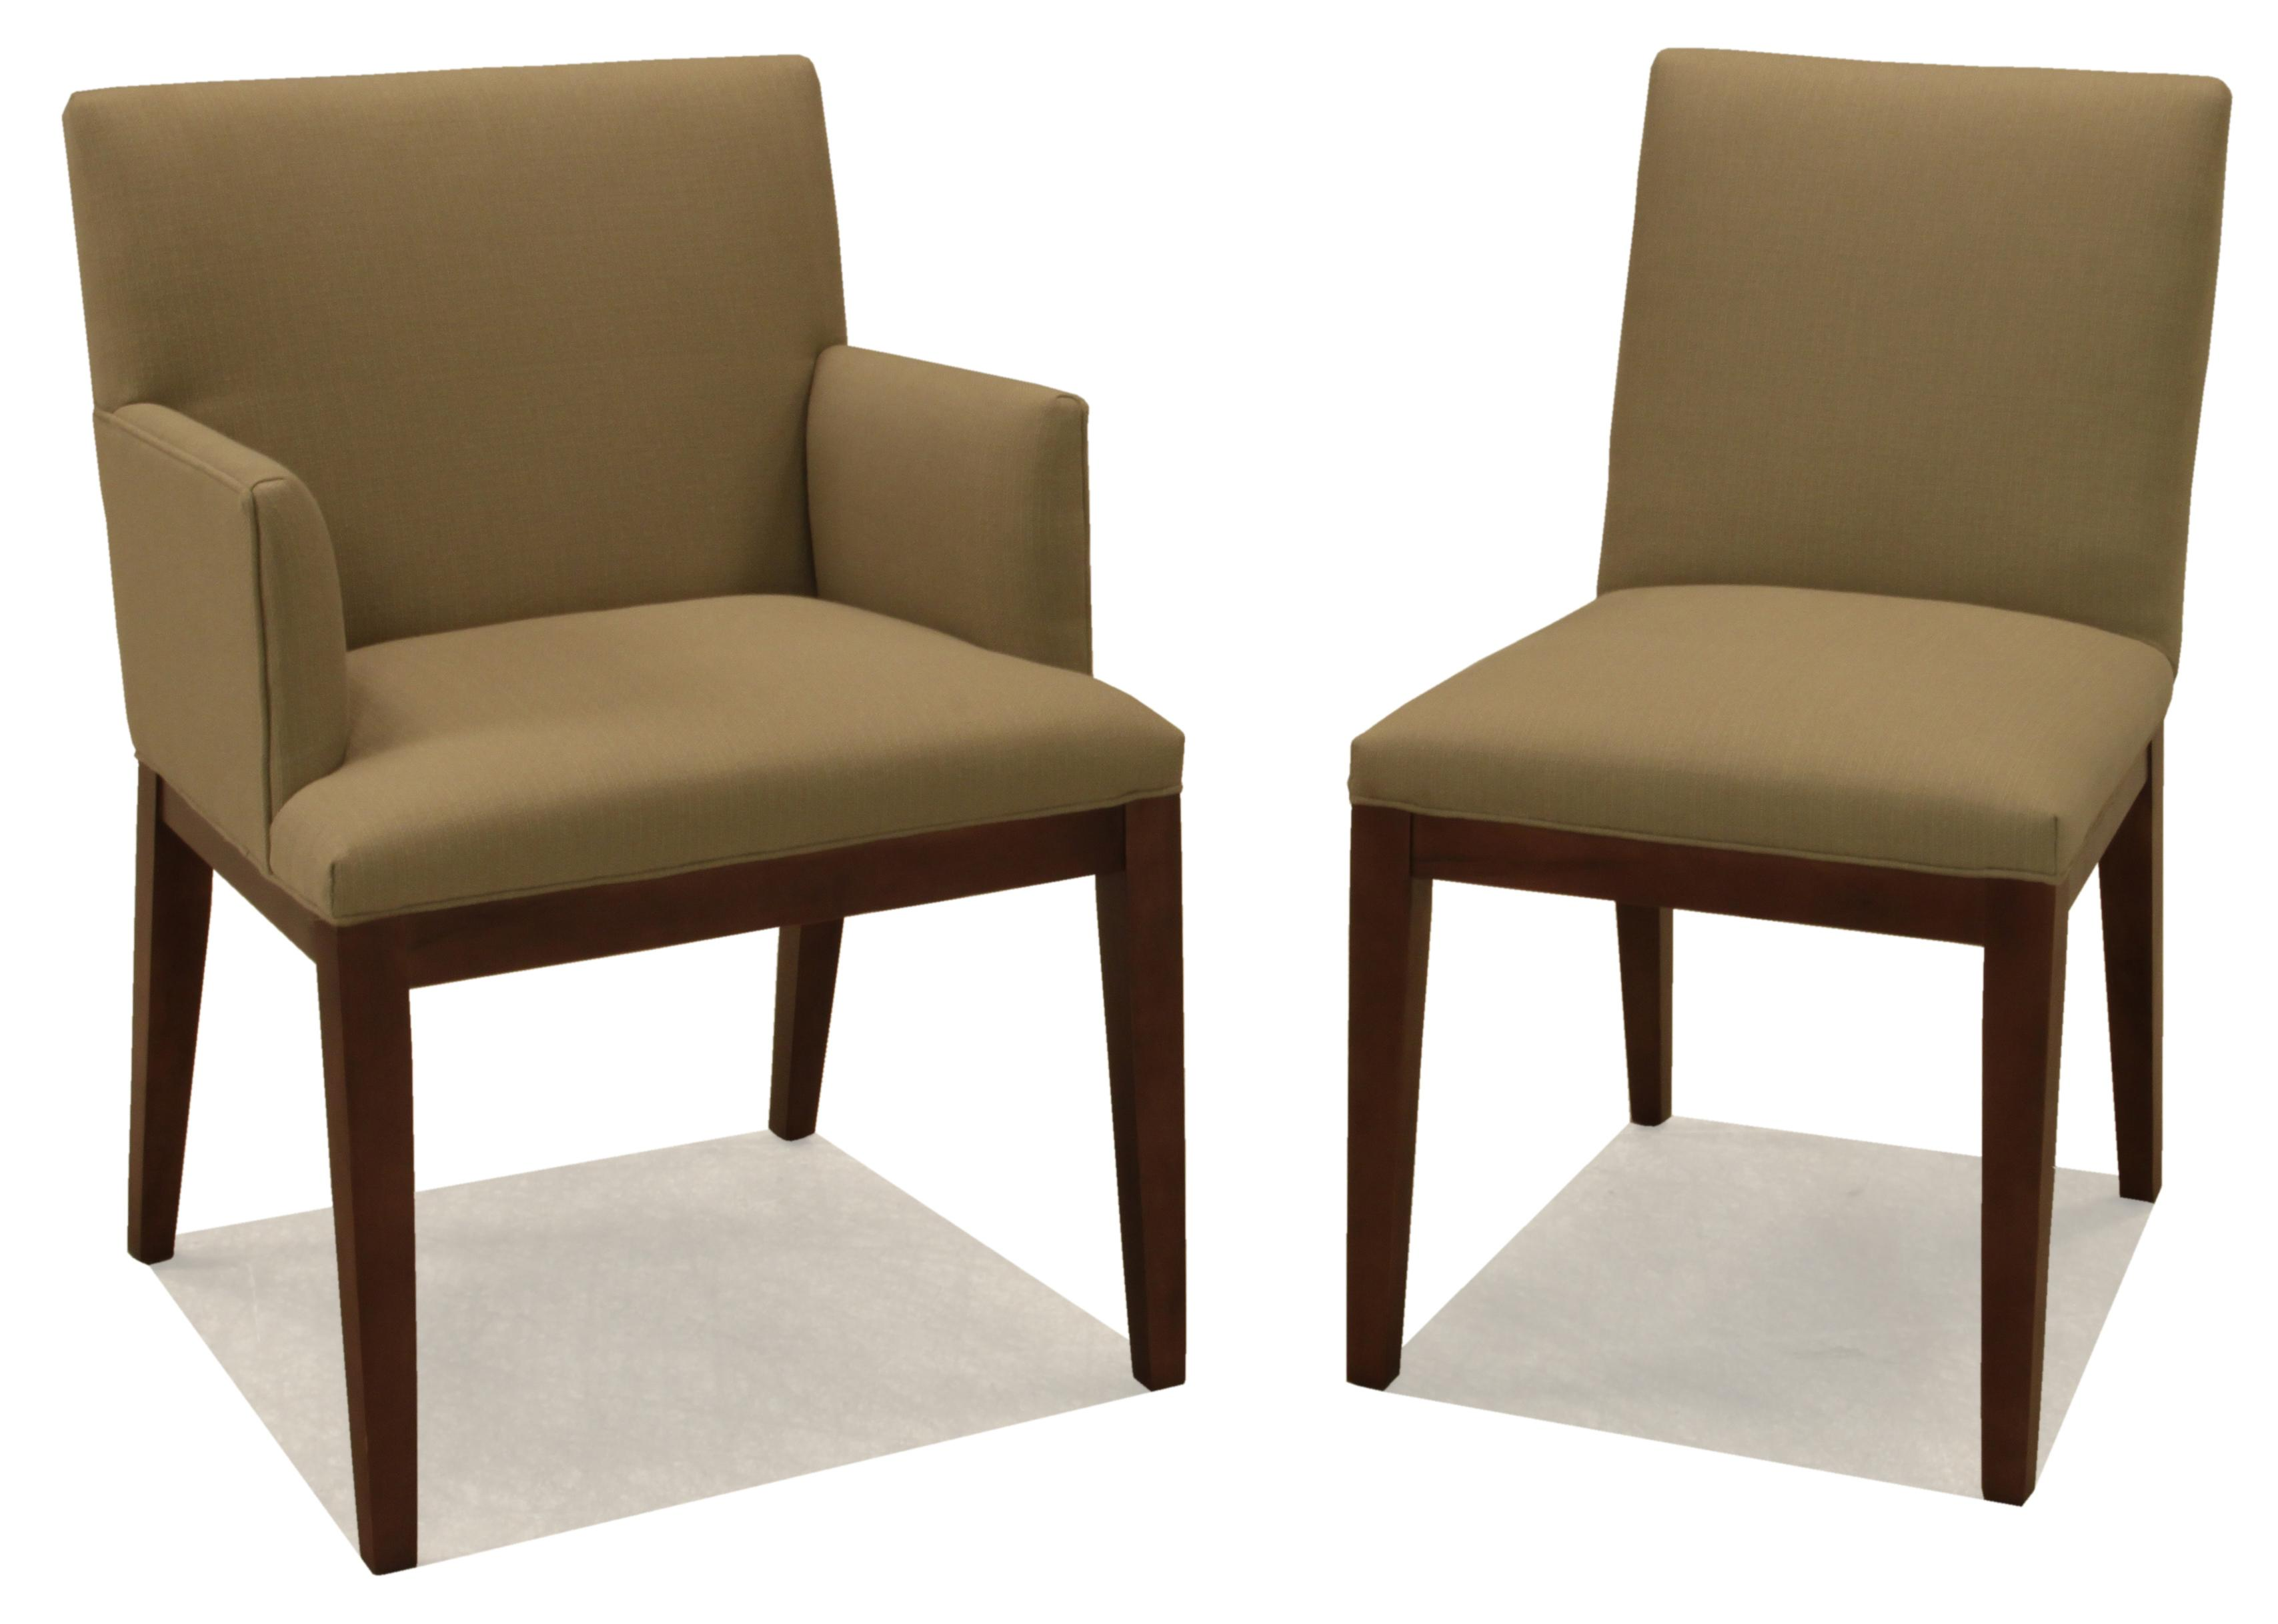 Pleasant Mccreary Modern Chair Seating Side Chair Mccreary Modern Machost Co Dining Chair Design Ideas Machostcouk